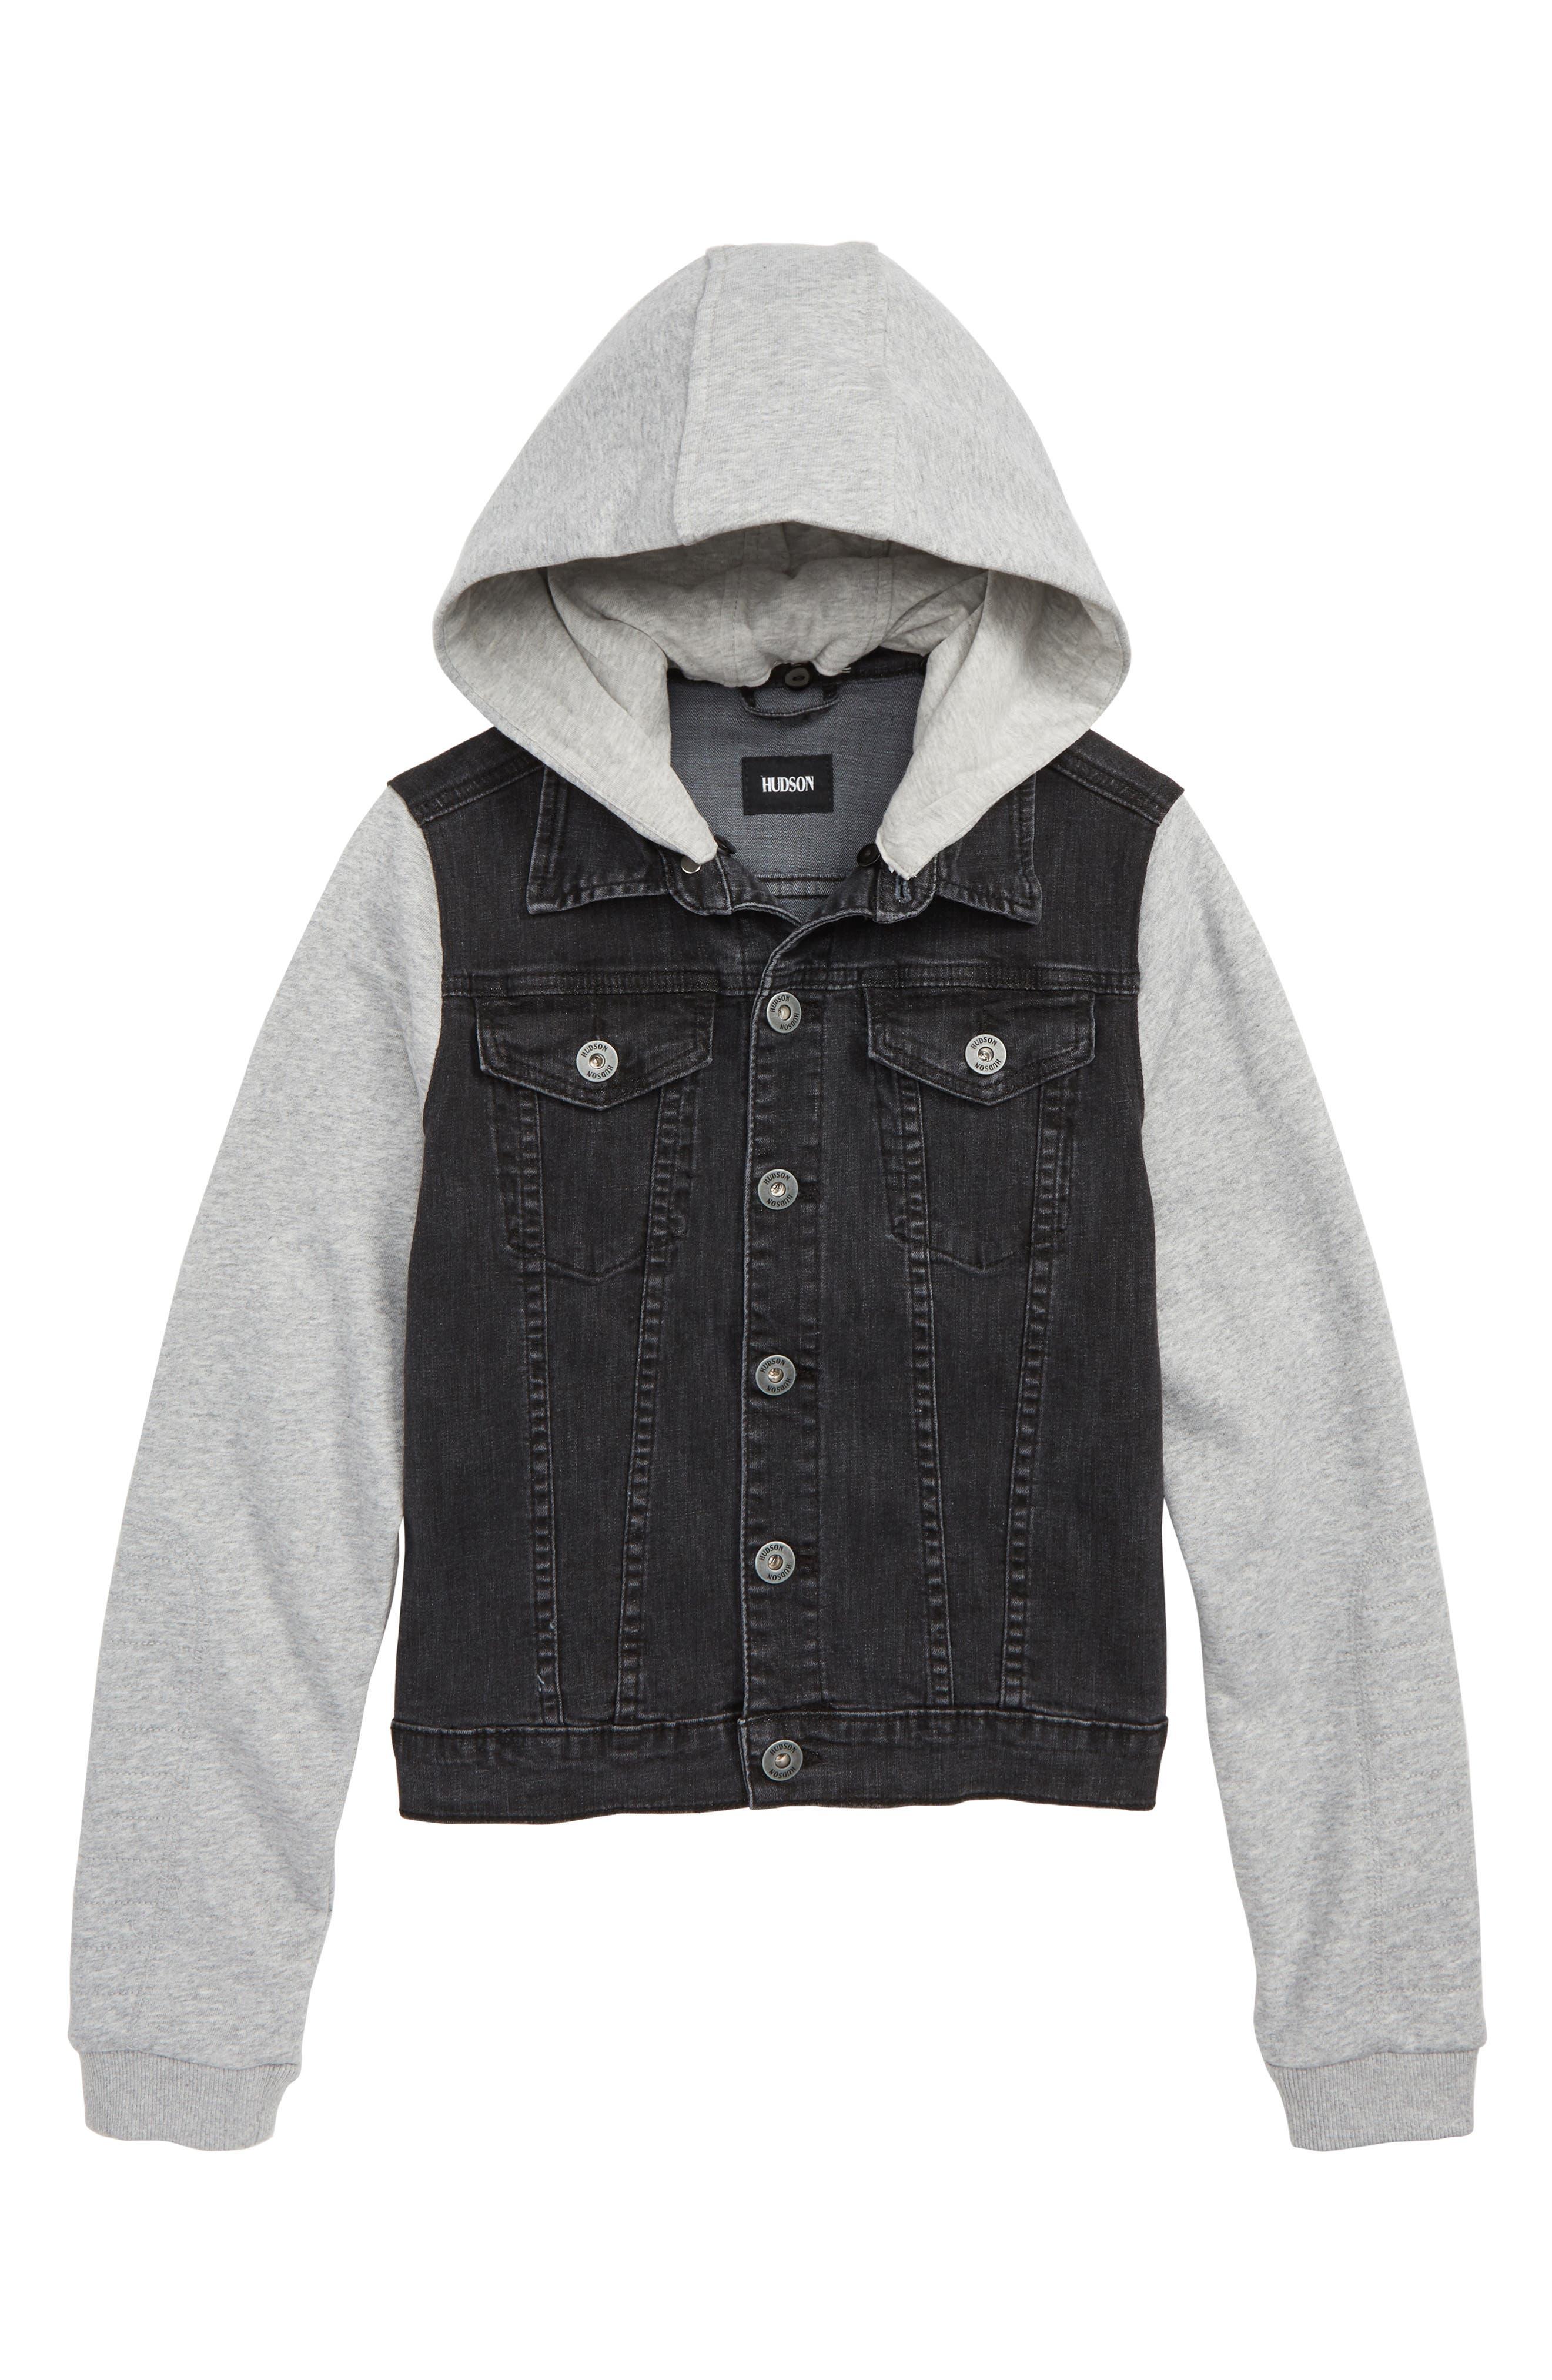 Emerson Hooded Denim Jacket,                         Main,                         color, GRAY